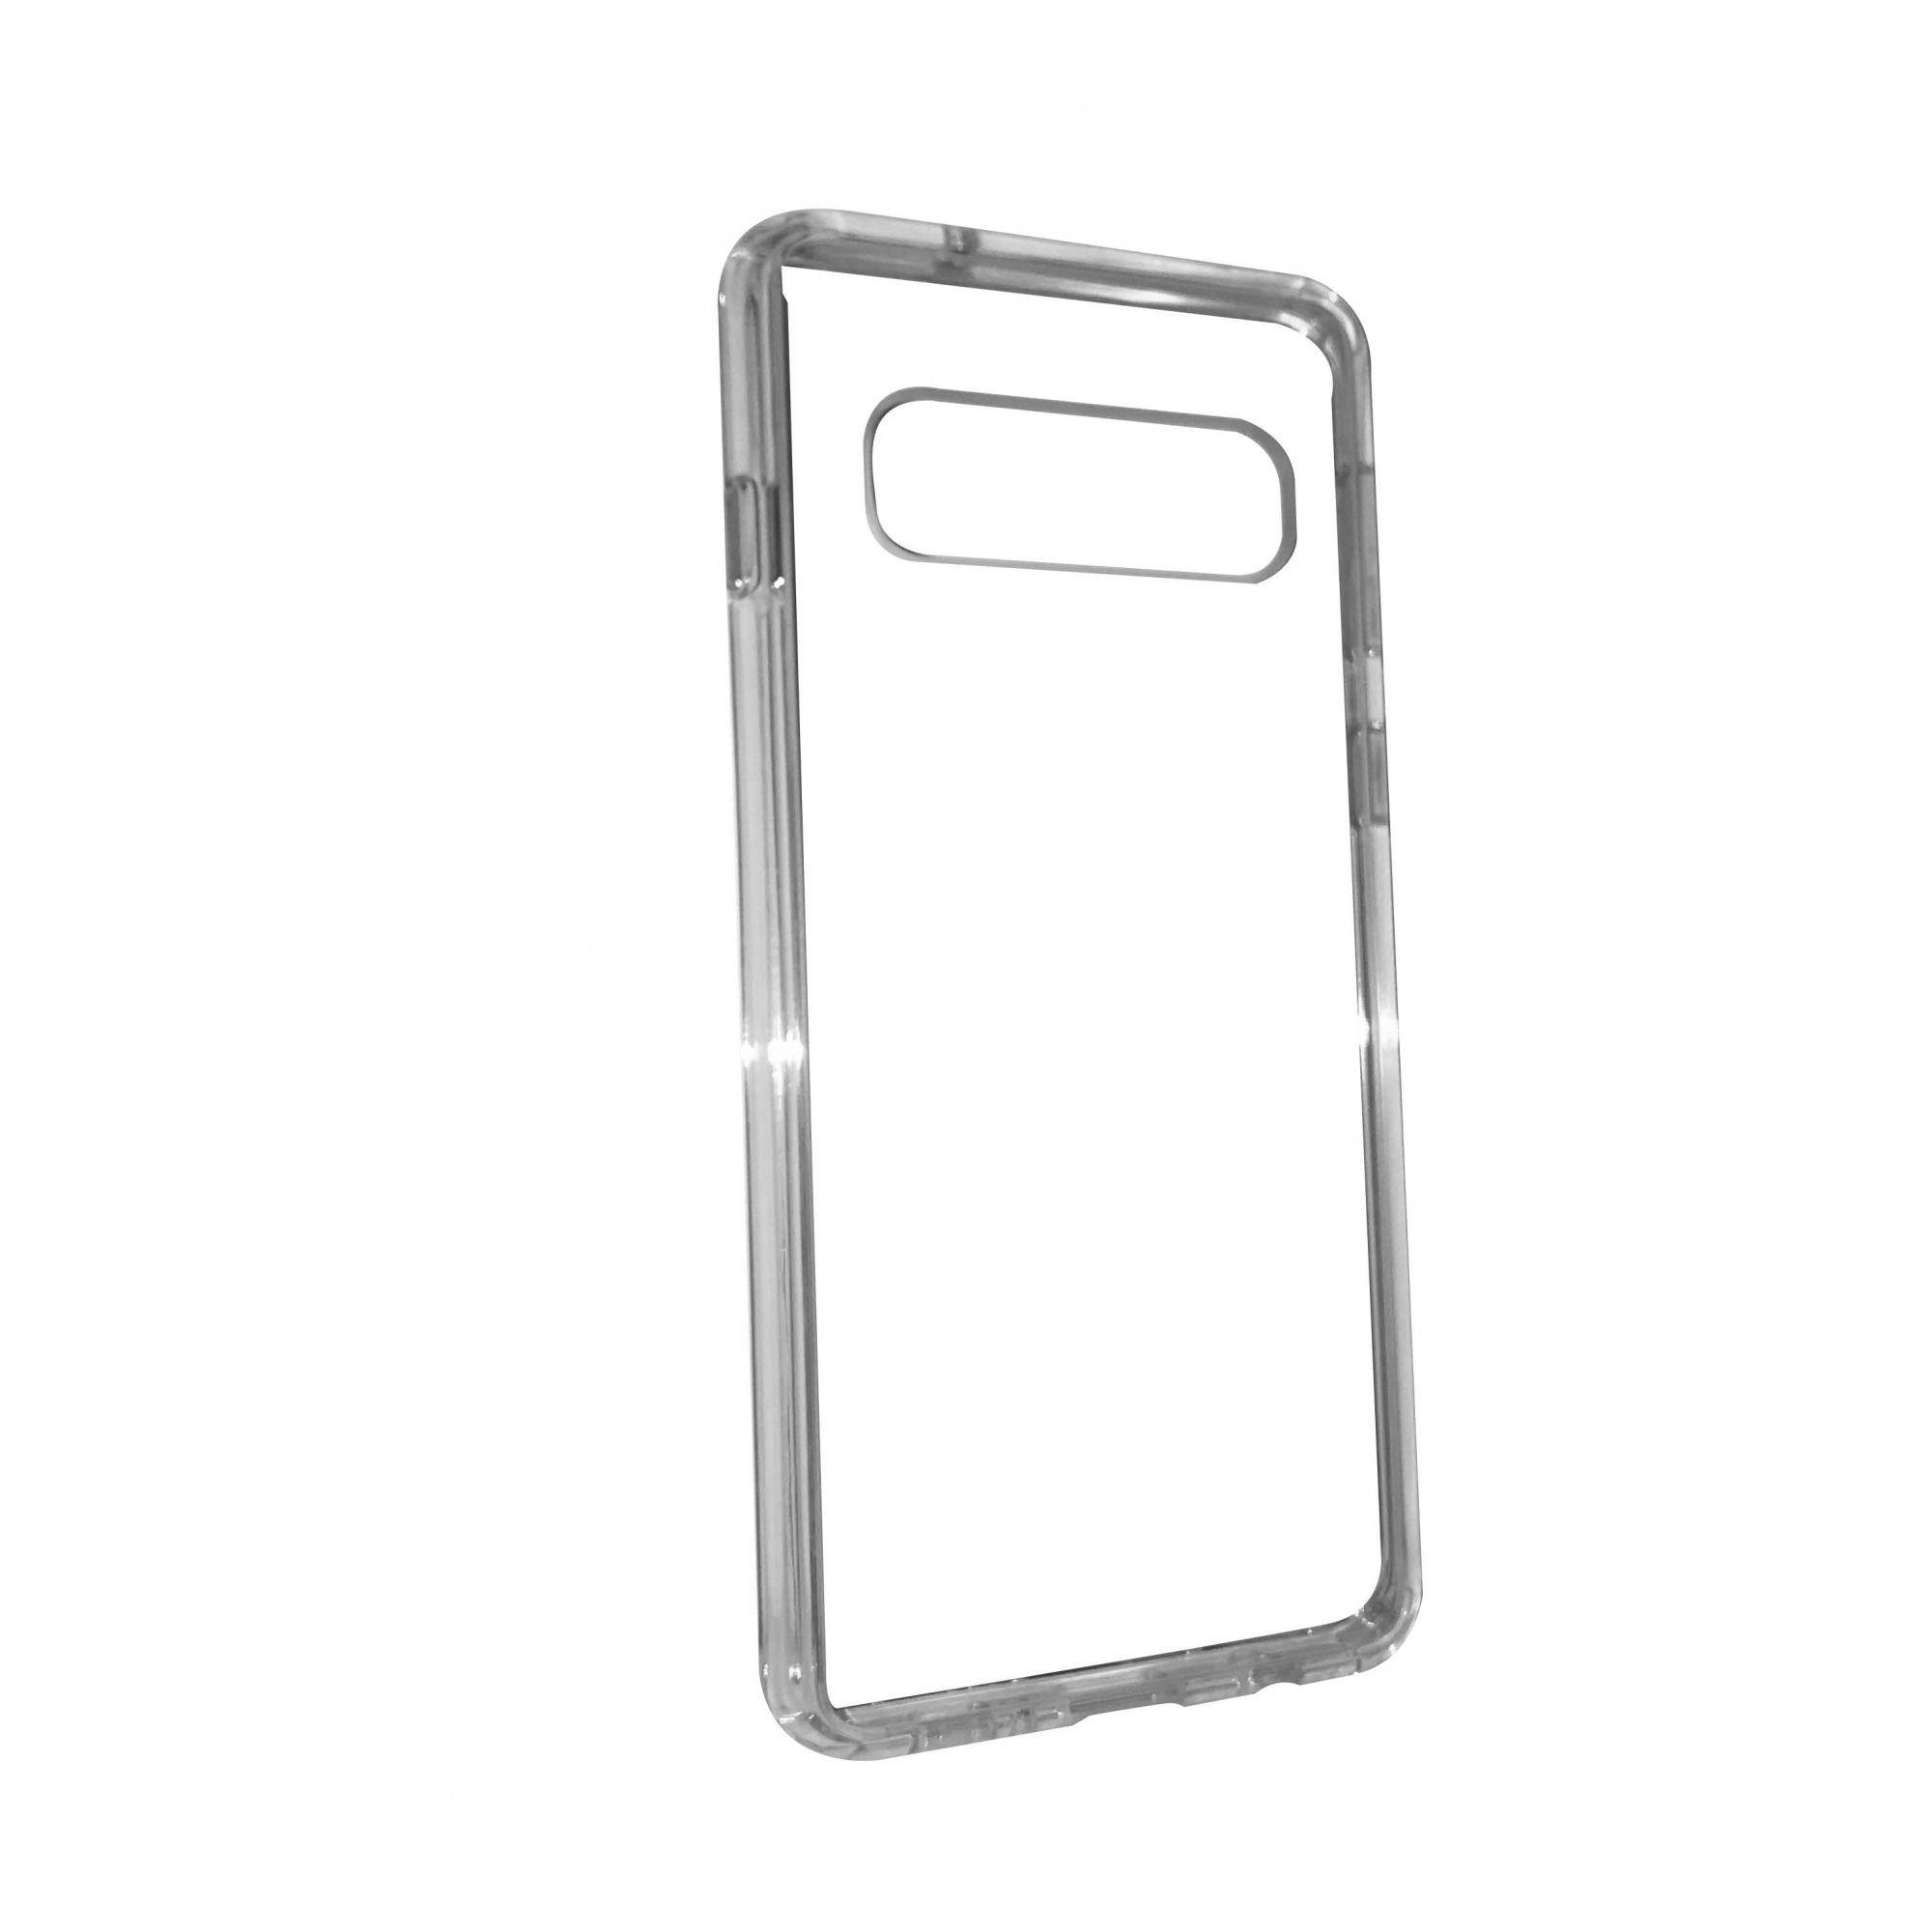 Capa iKase Krystal Samsung Galaxy S10E